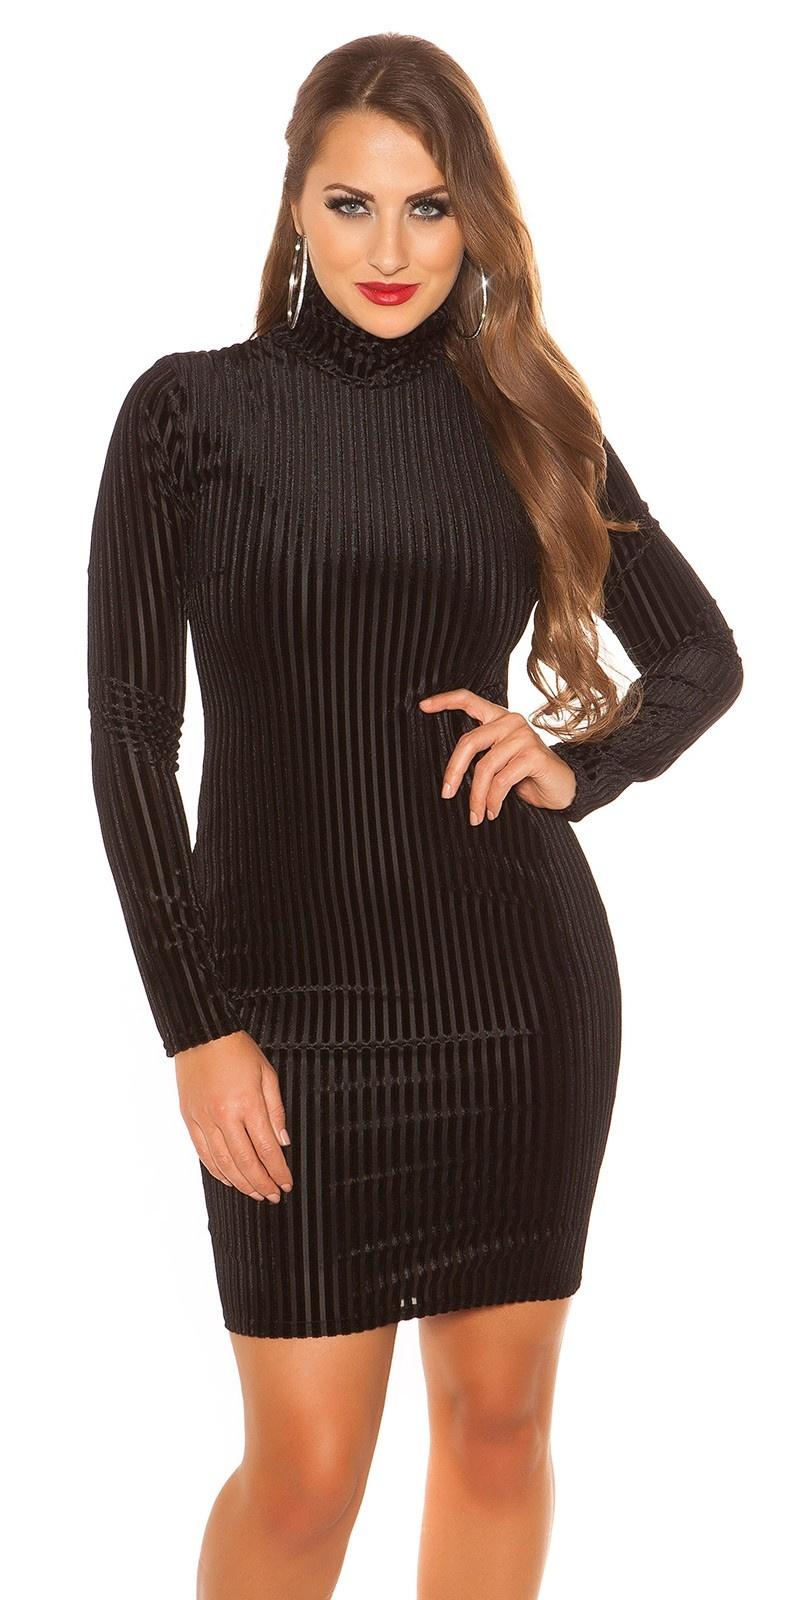 Sexy col mini jurkje lange mouw geribbeld zwart